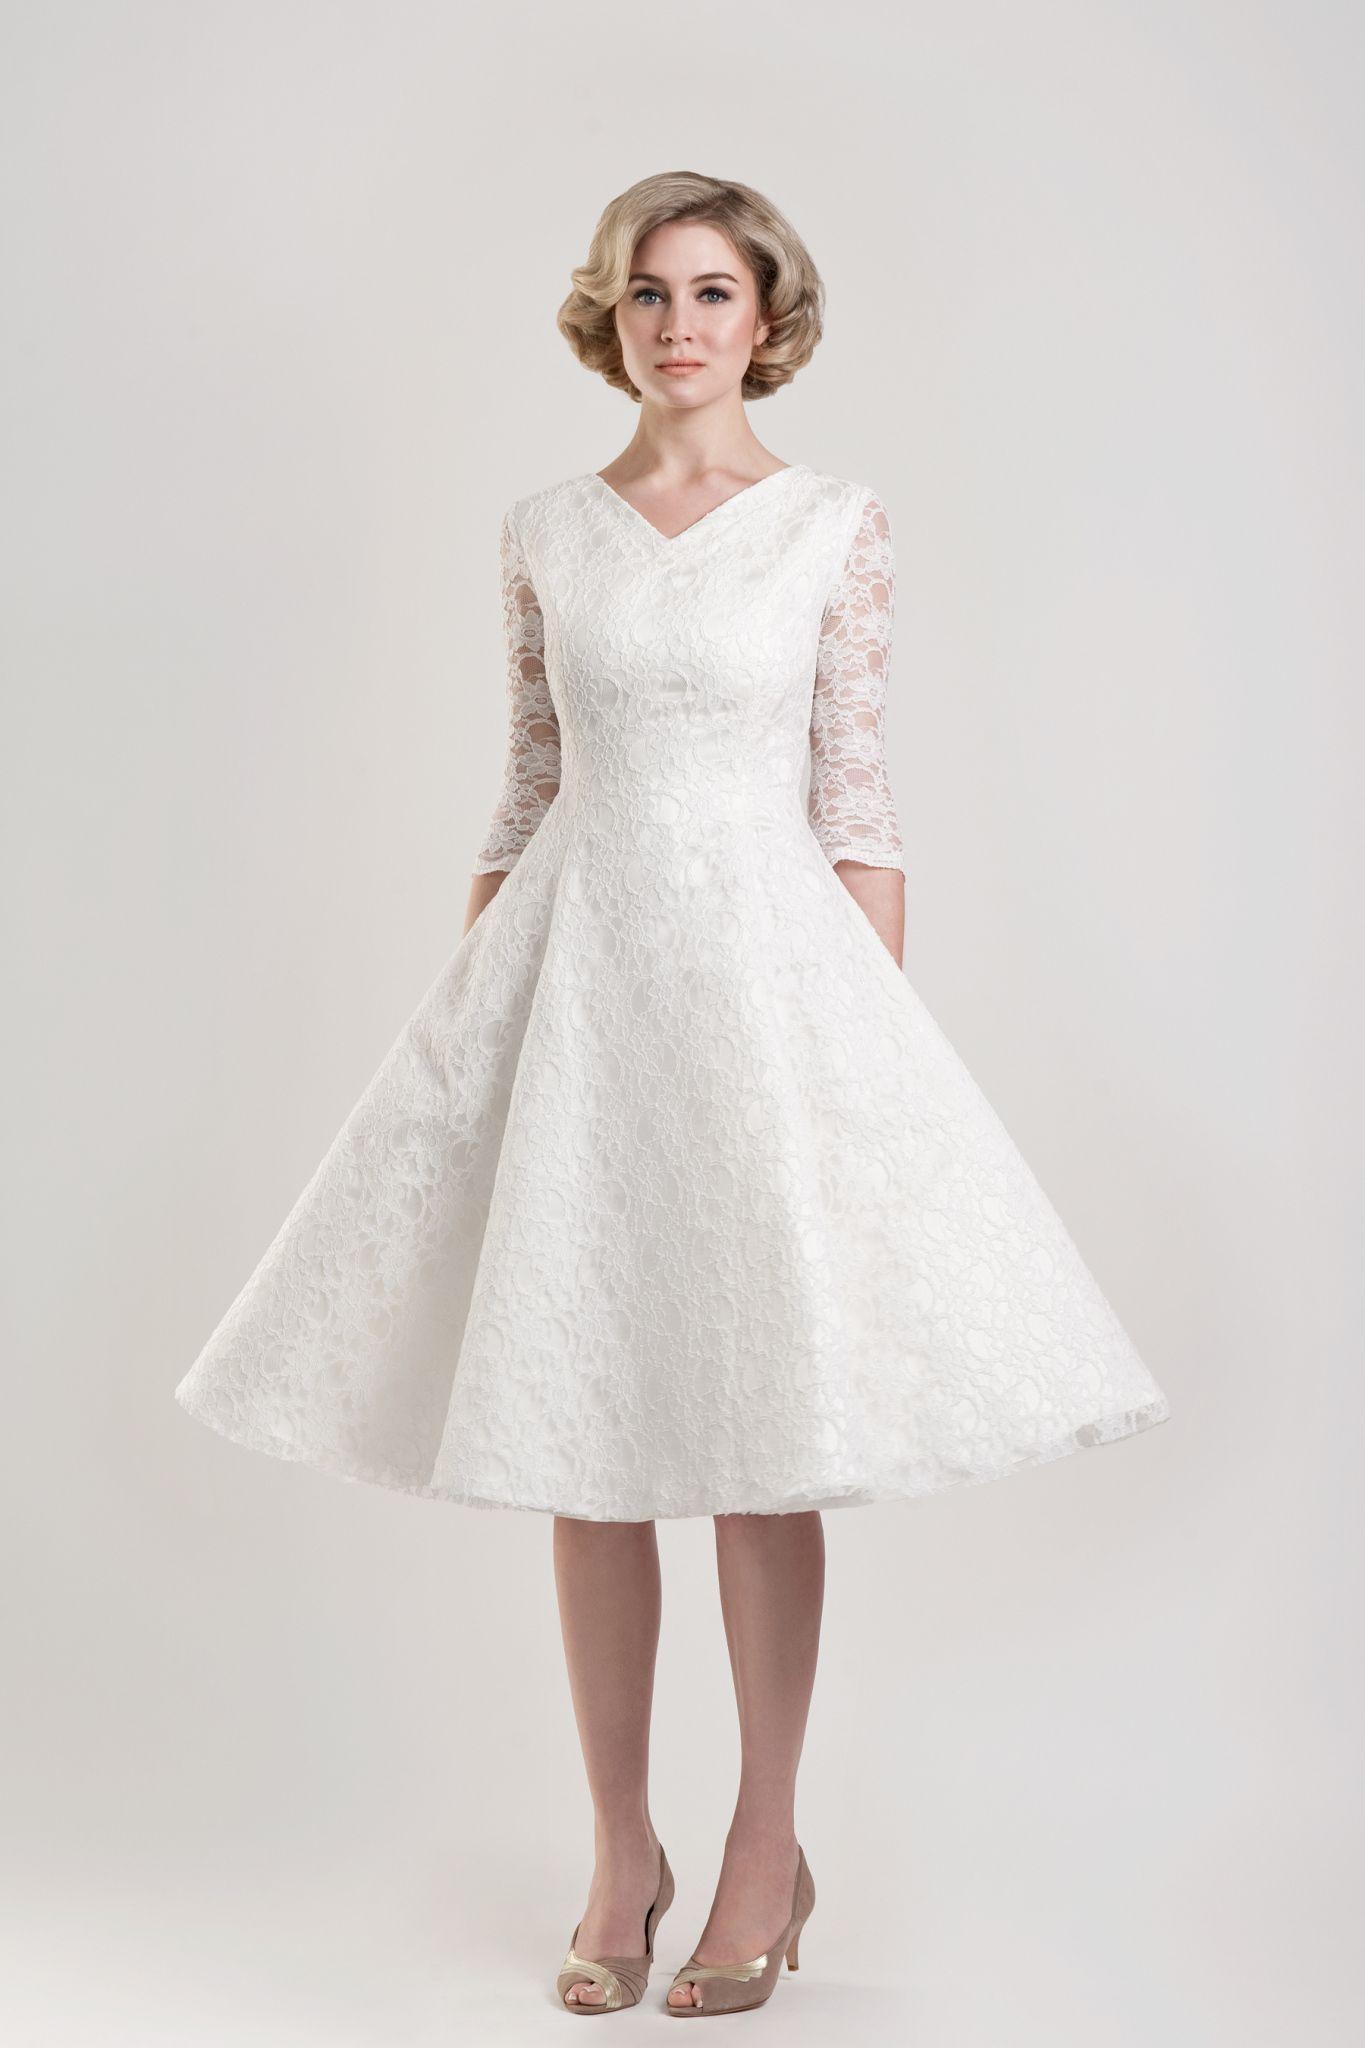 Tea Length Wedding Dresses for Older Women Plus Size